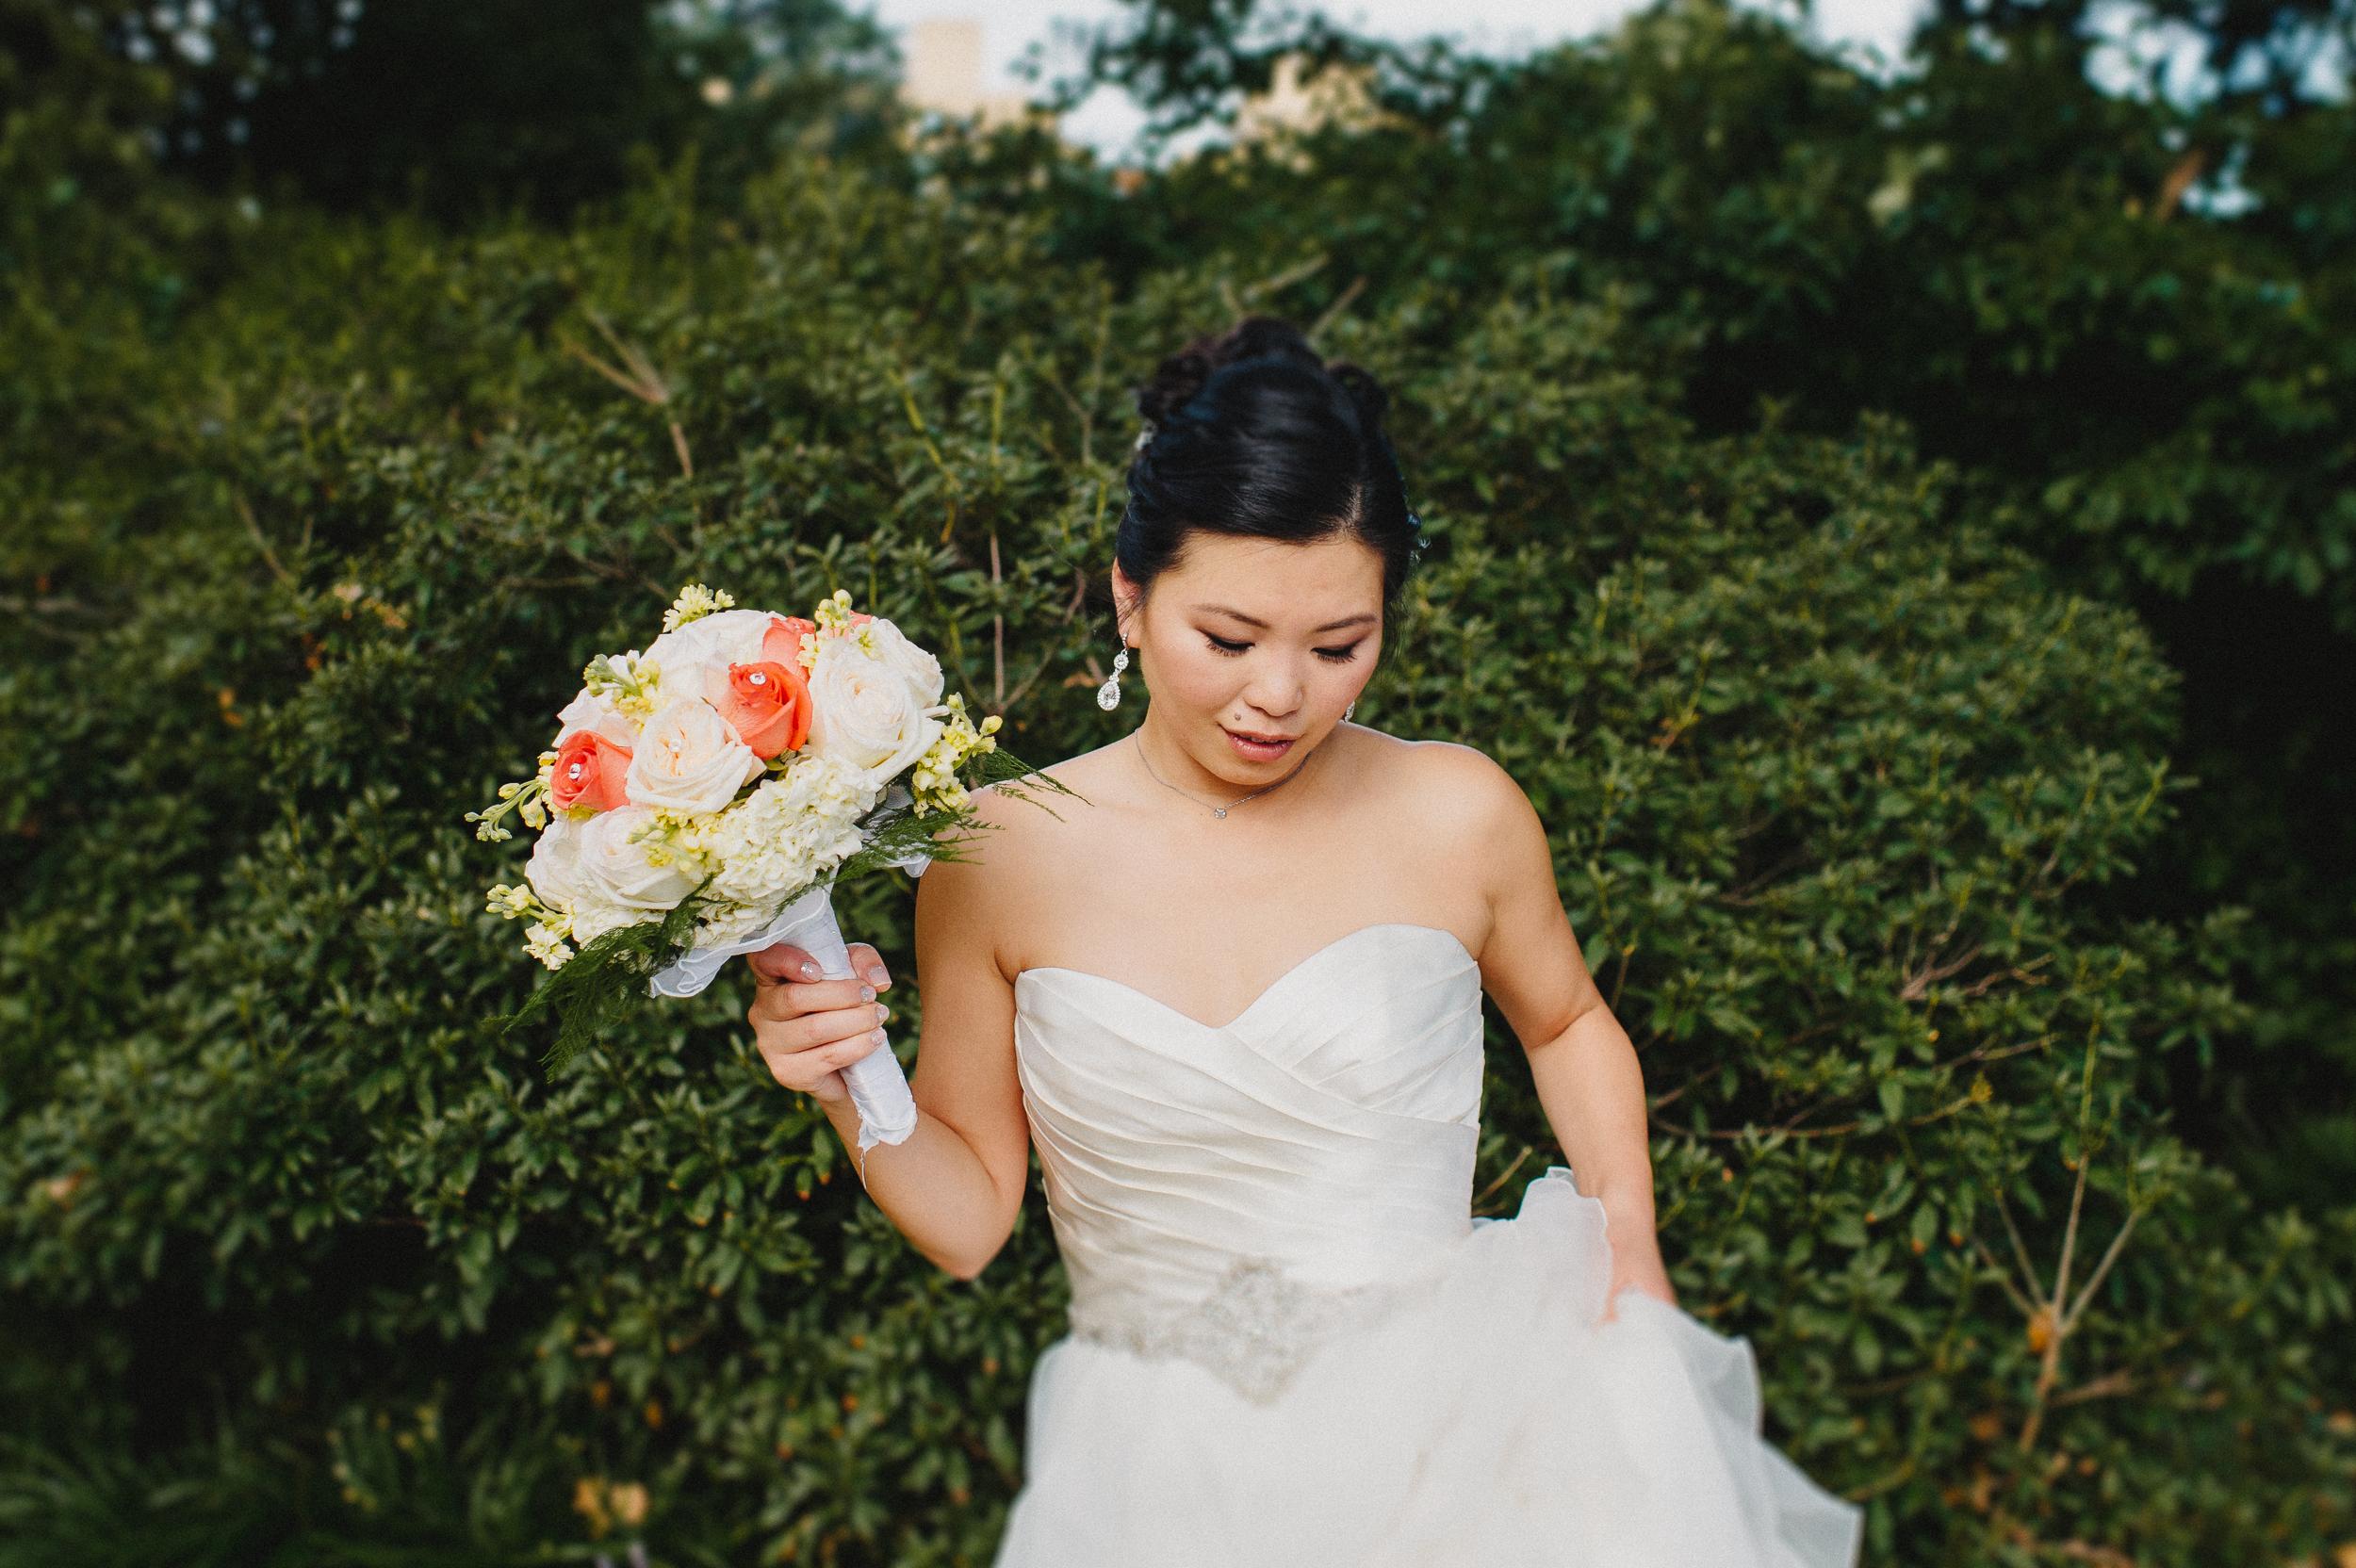 union-trust-philadelphia-wedding-photographer-57.jpg